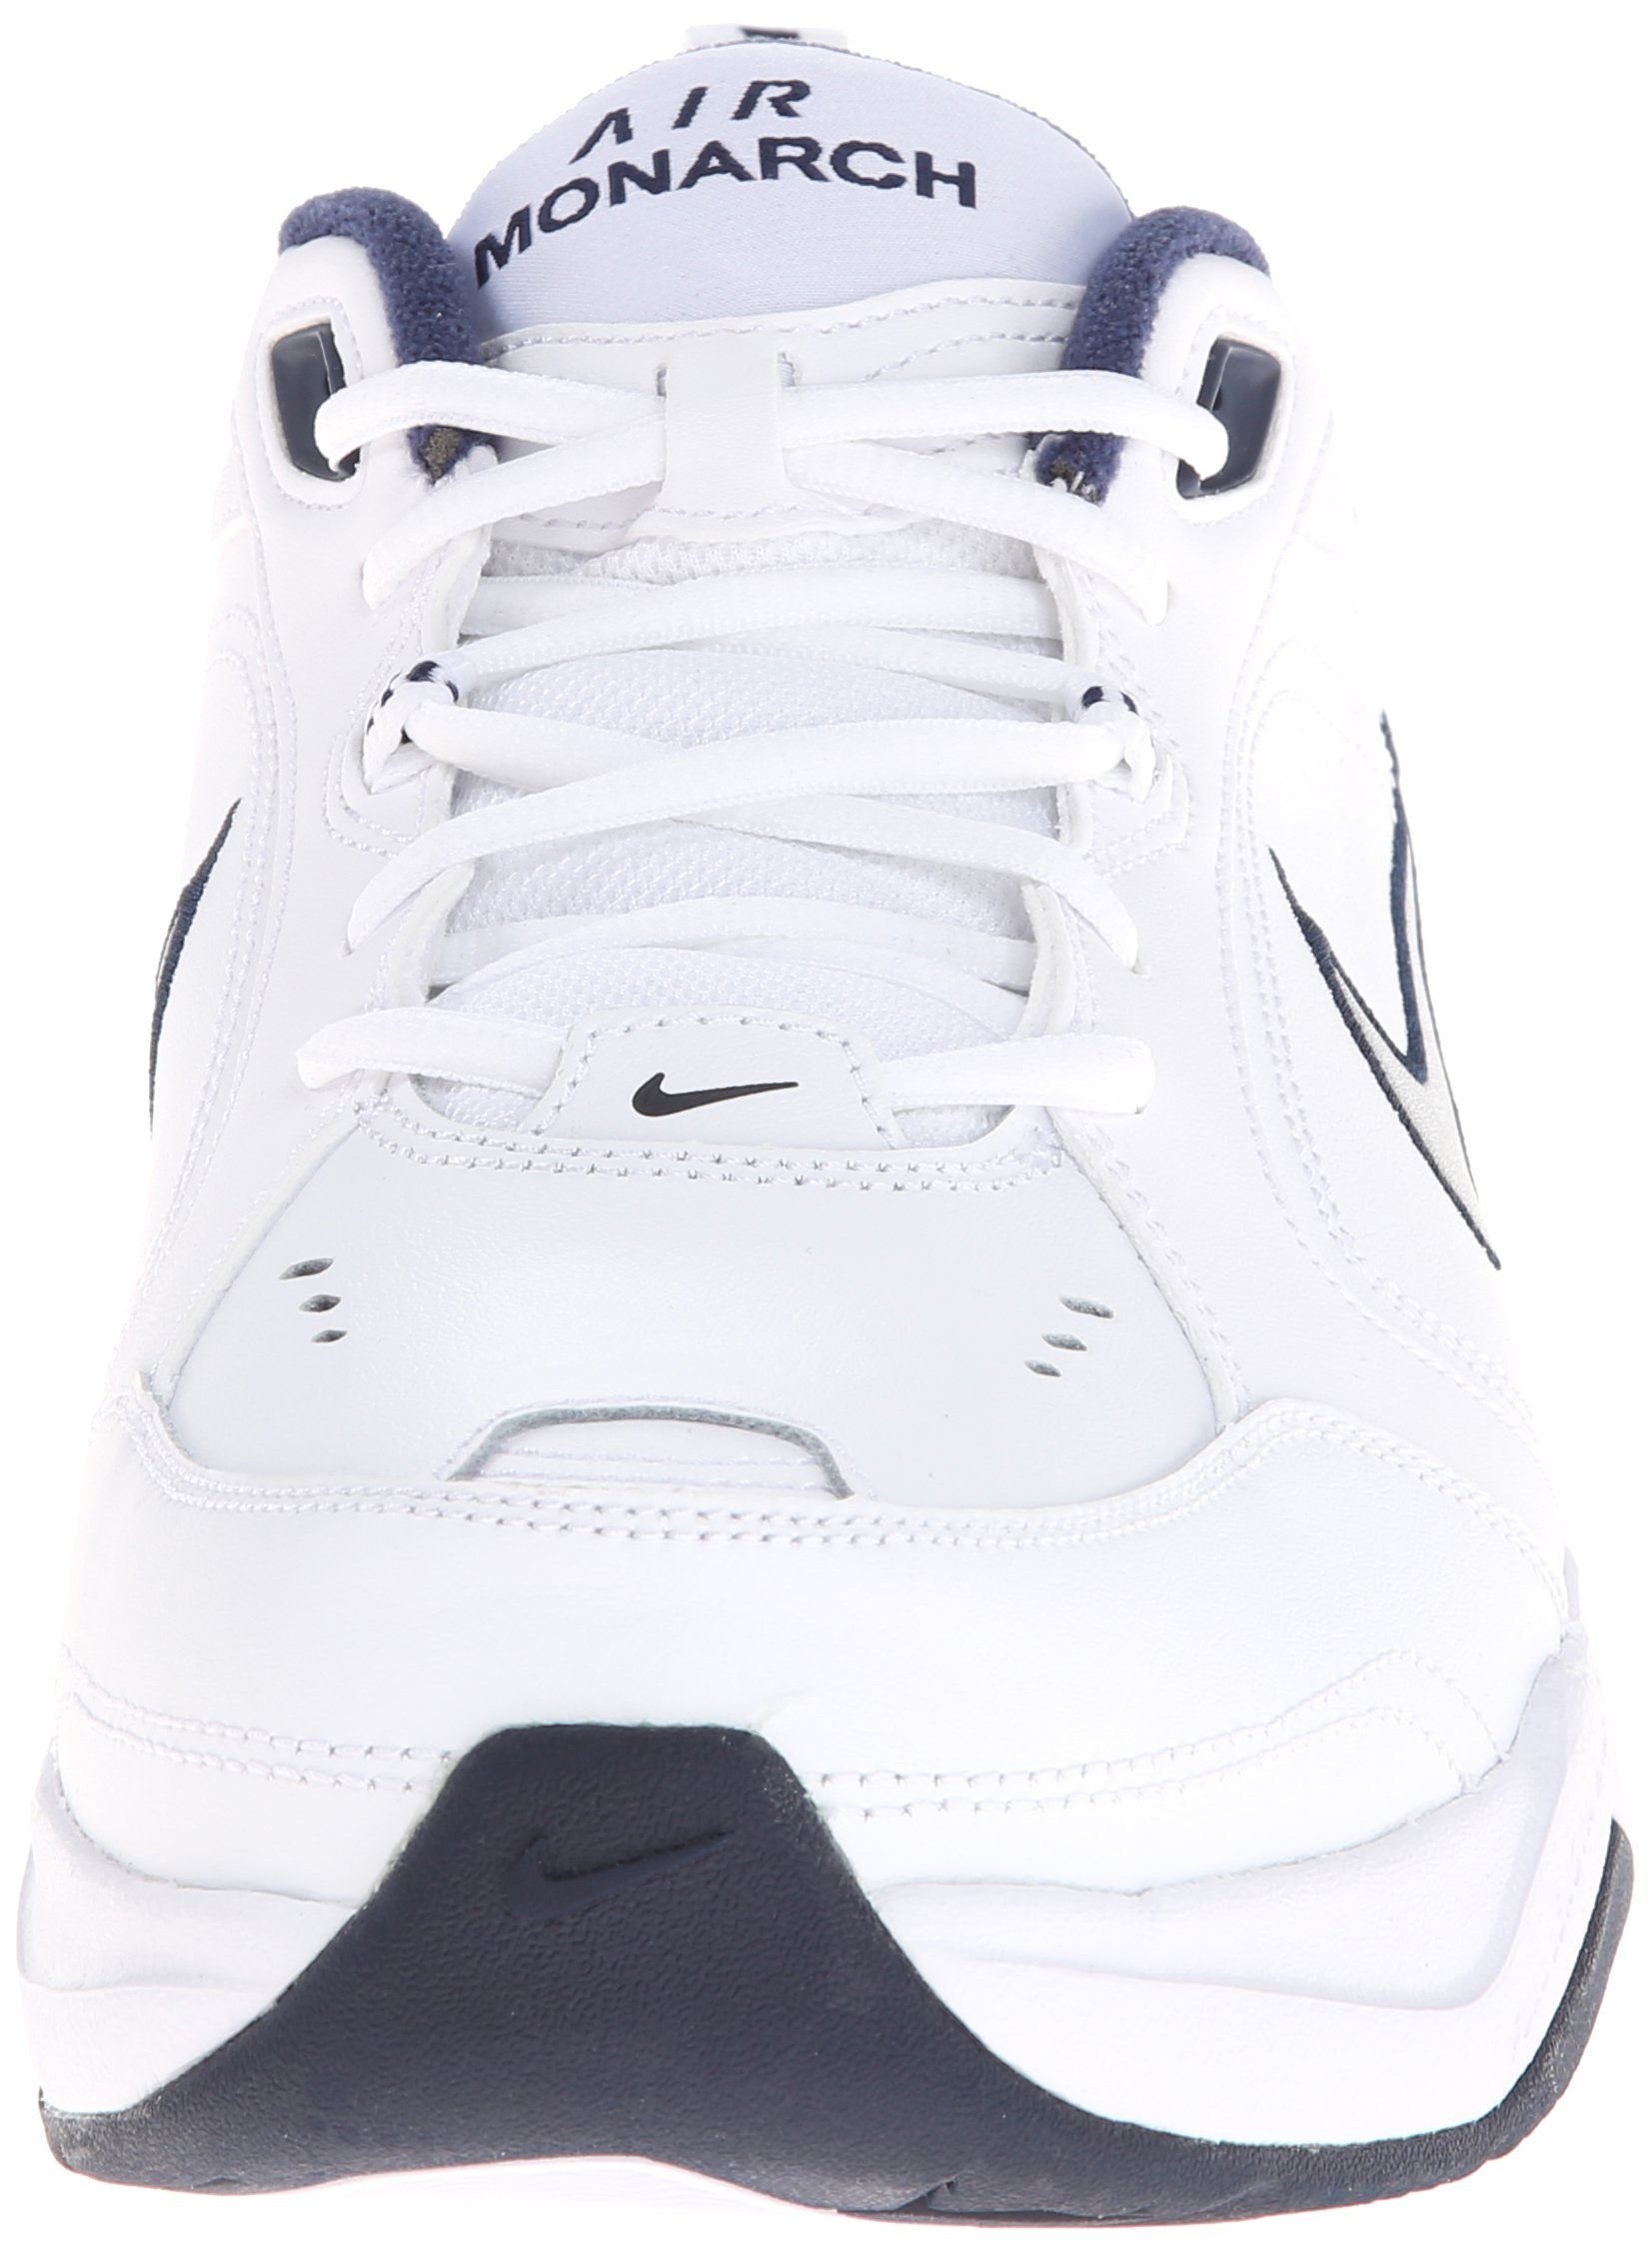 Nike-Men-039-s-Air-Monarch-IV-Cross-Trainer-Sneaker-416355 thumbnail 18